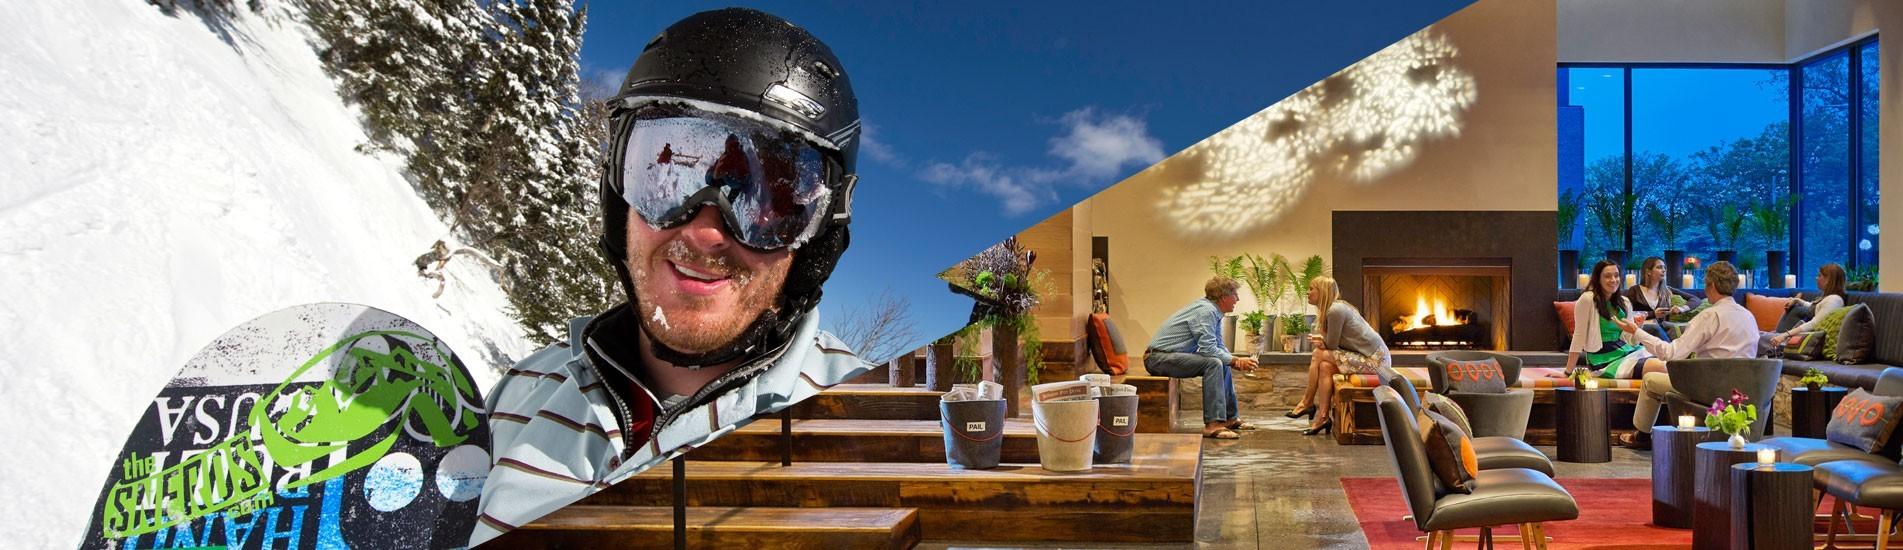 hotel-vermont-bar-and-smowboarding-header.jpg